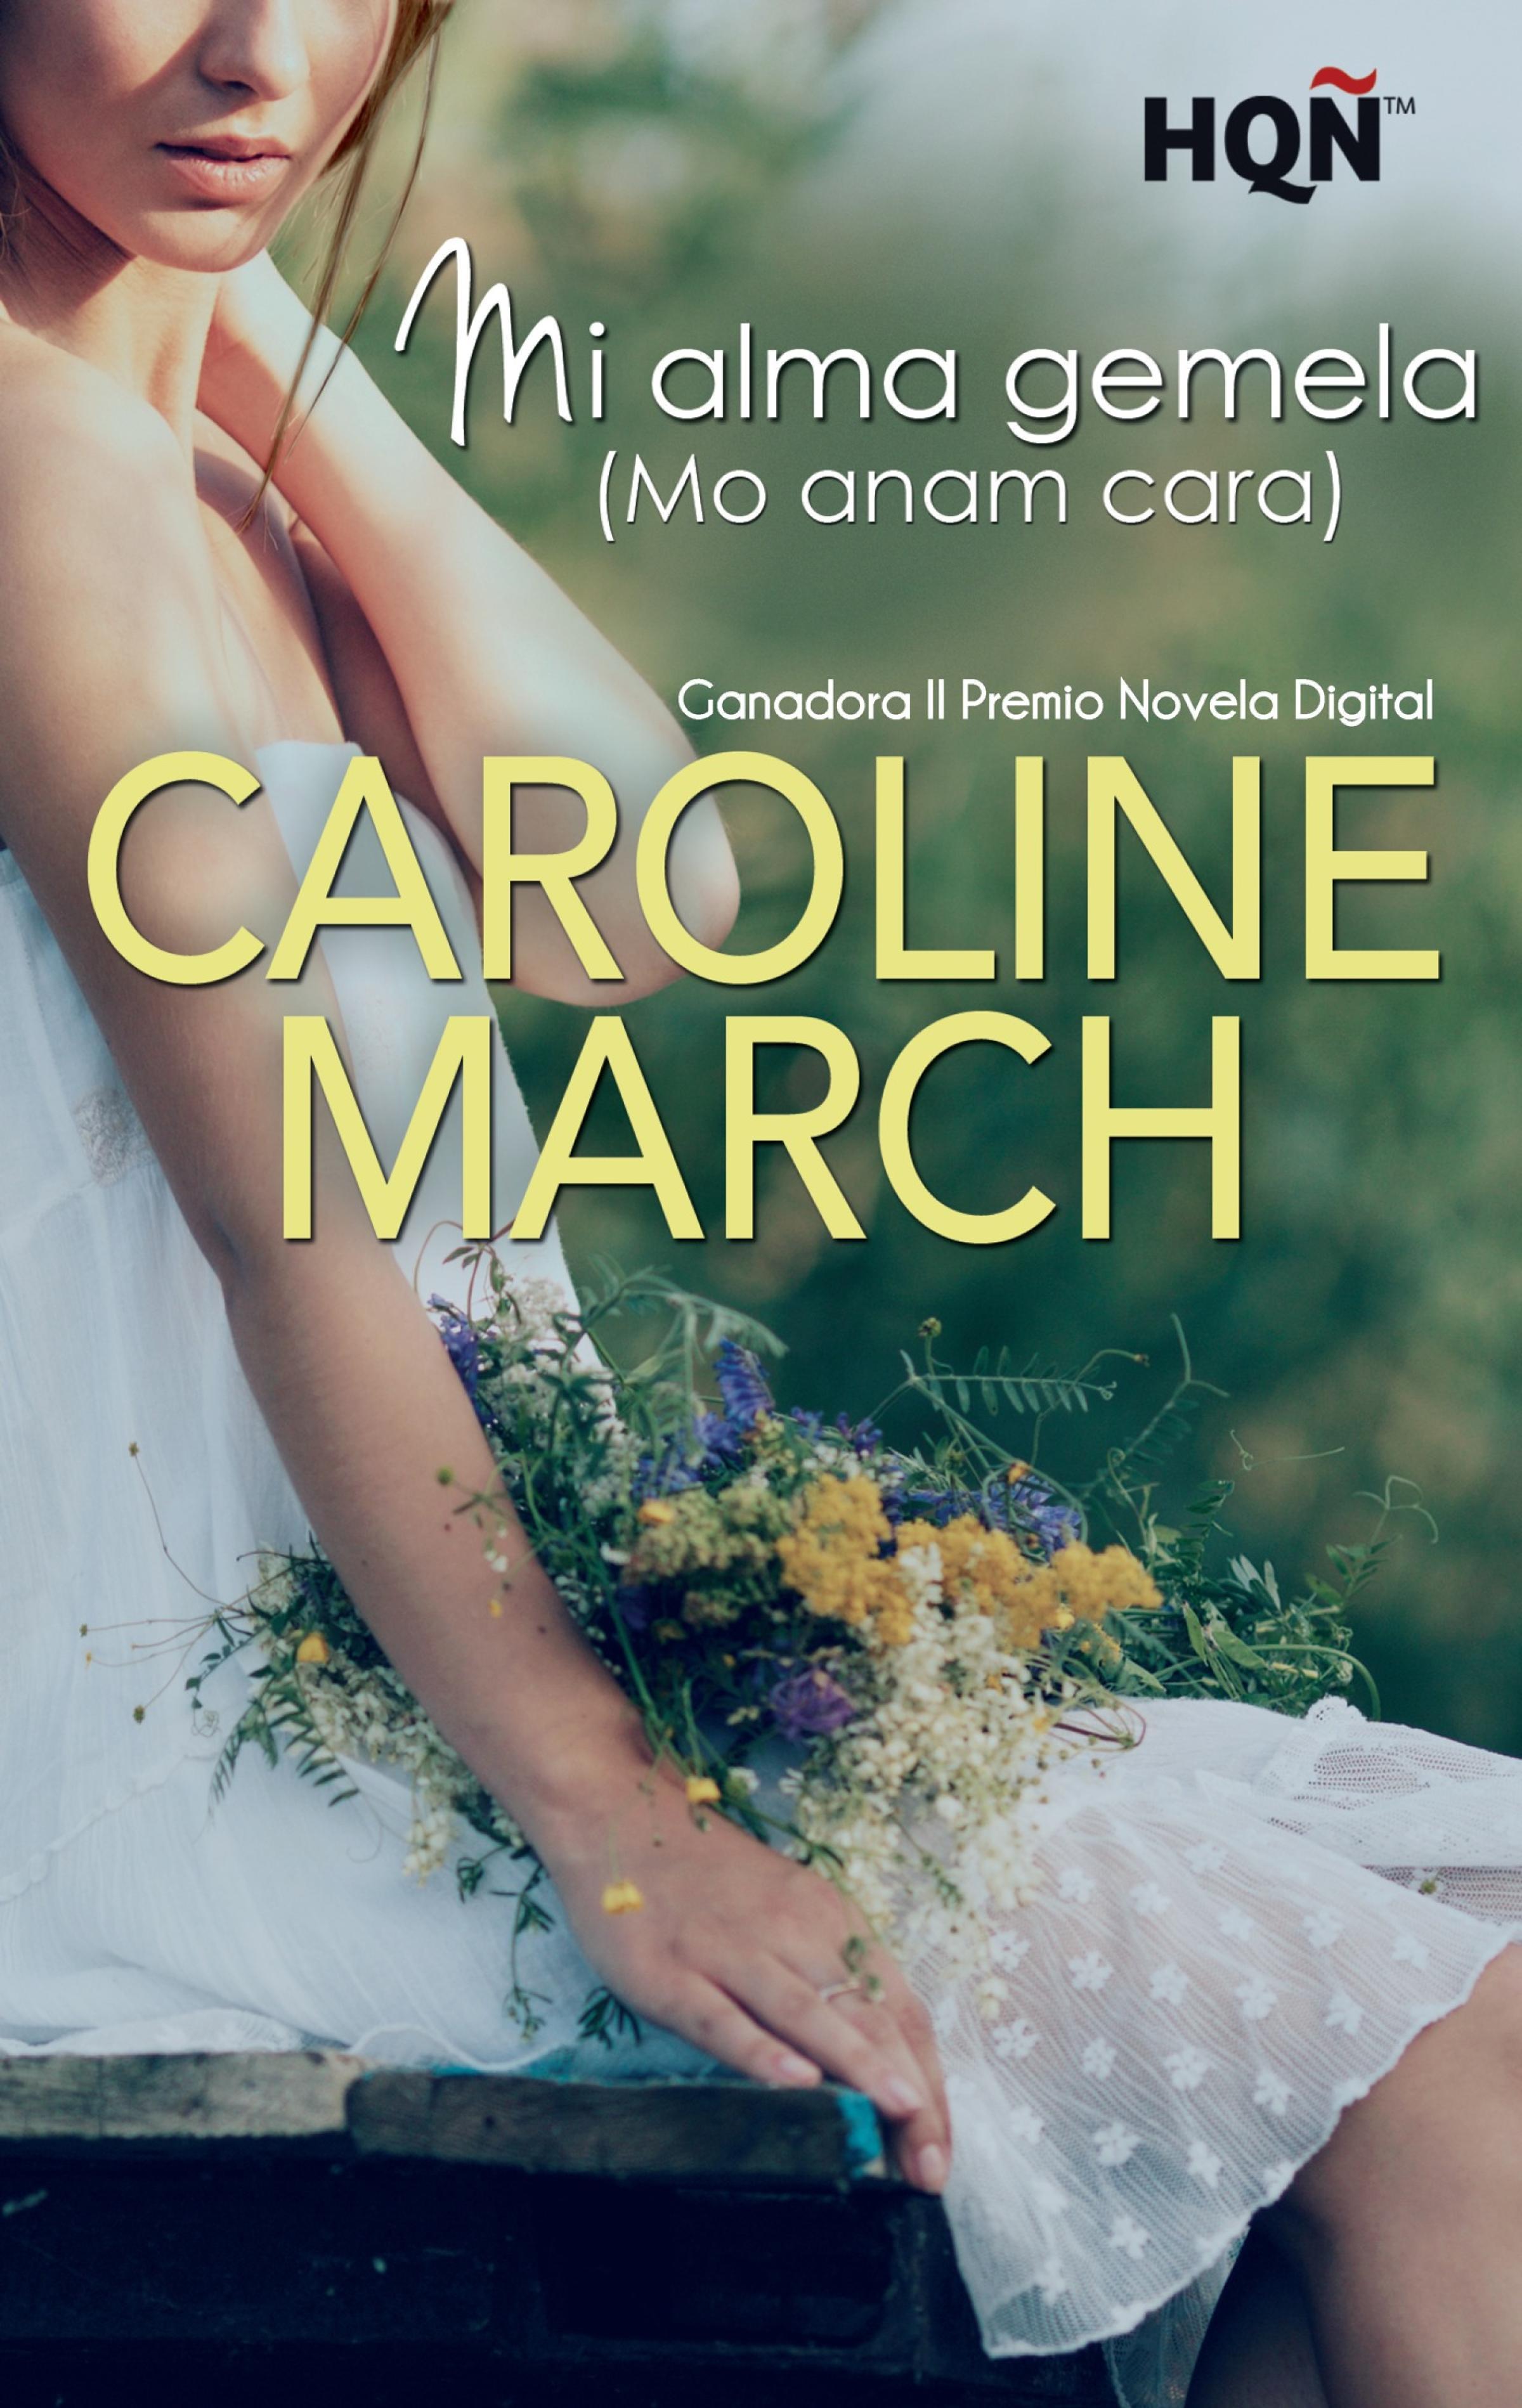 Mi alma gemela (Mo anam cara) - Ganadora II Premio Digital ( Caroline March  )